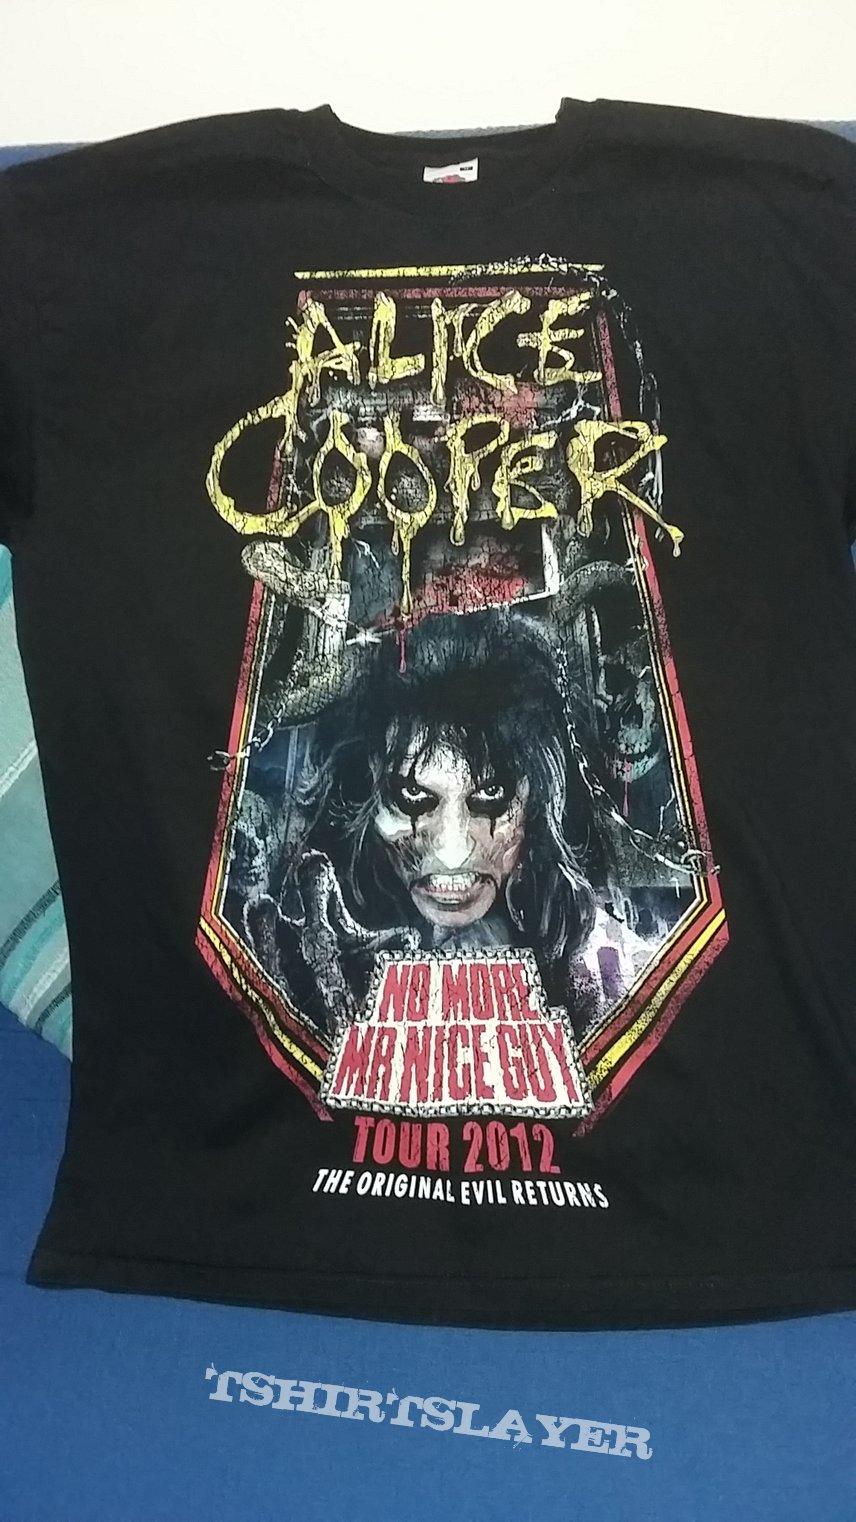 Alice Cooper - No More Mr. Nice Guy Tour - 2012